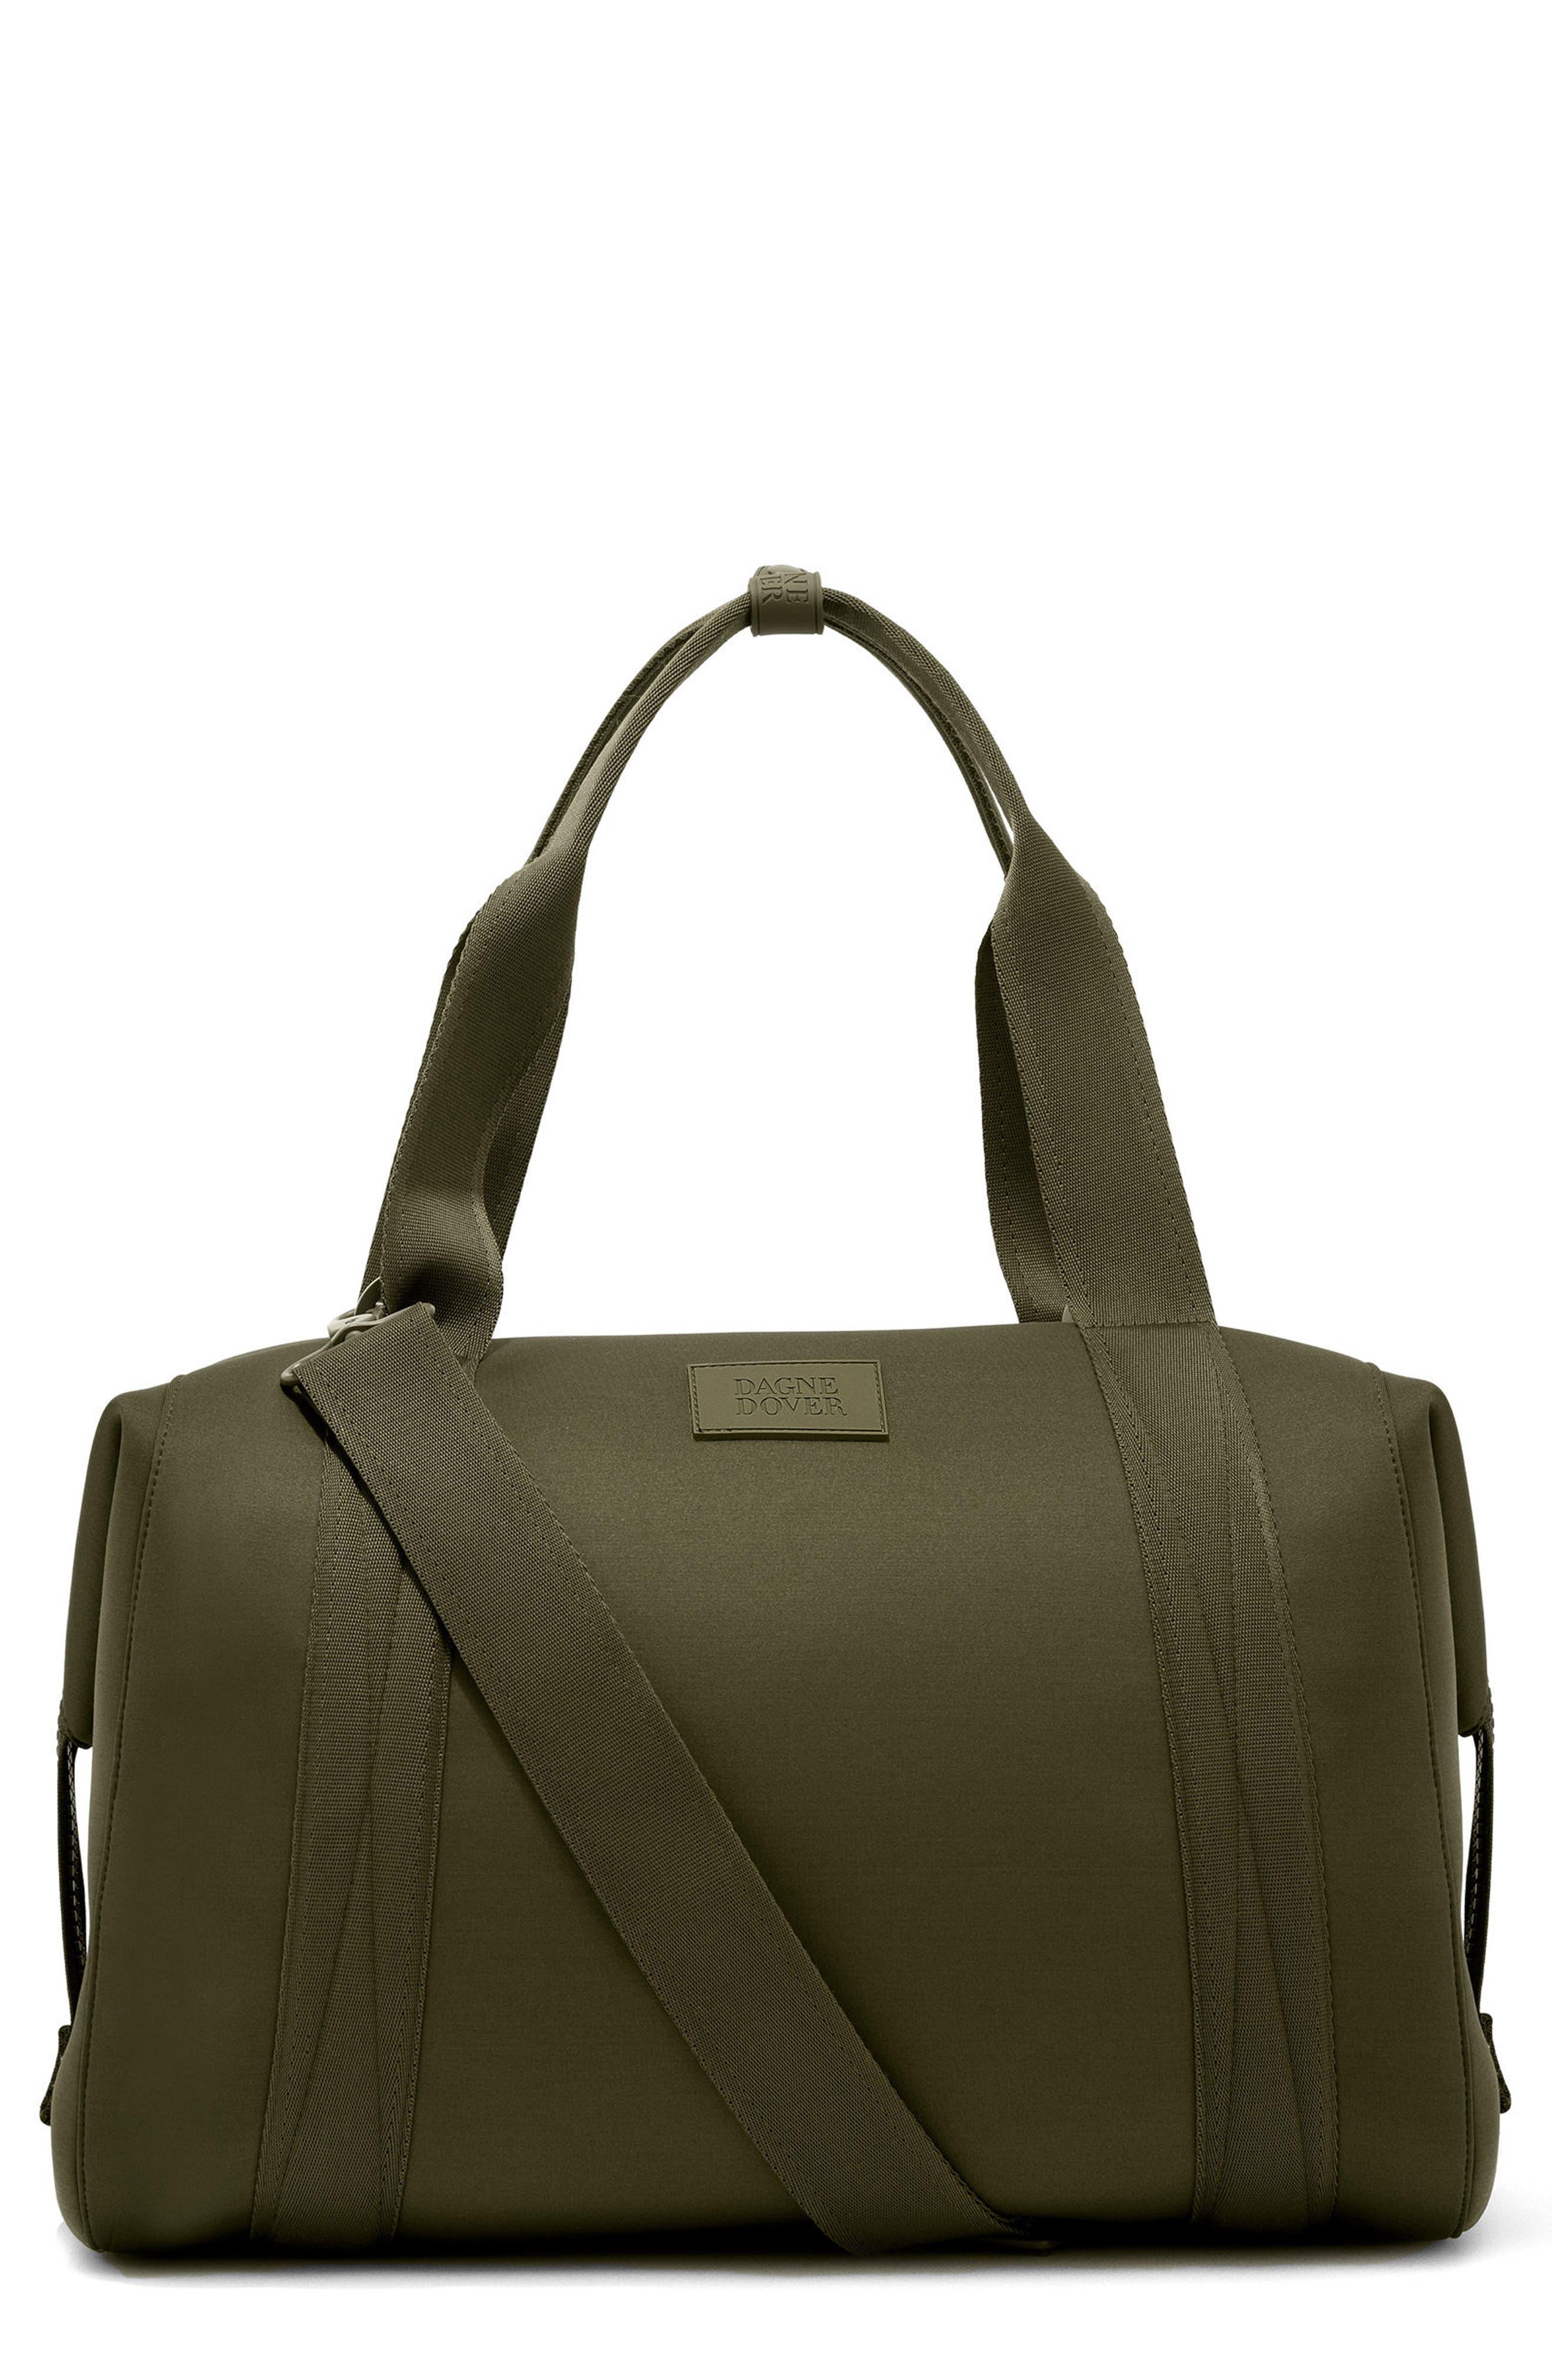 365 Large Landon Neoprene Carryall Duffel Bag,                         Main,                         color, DARK MOSS